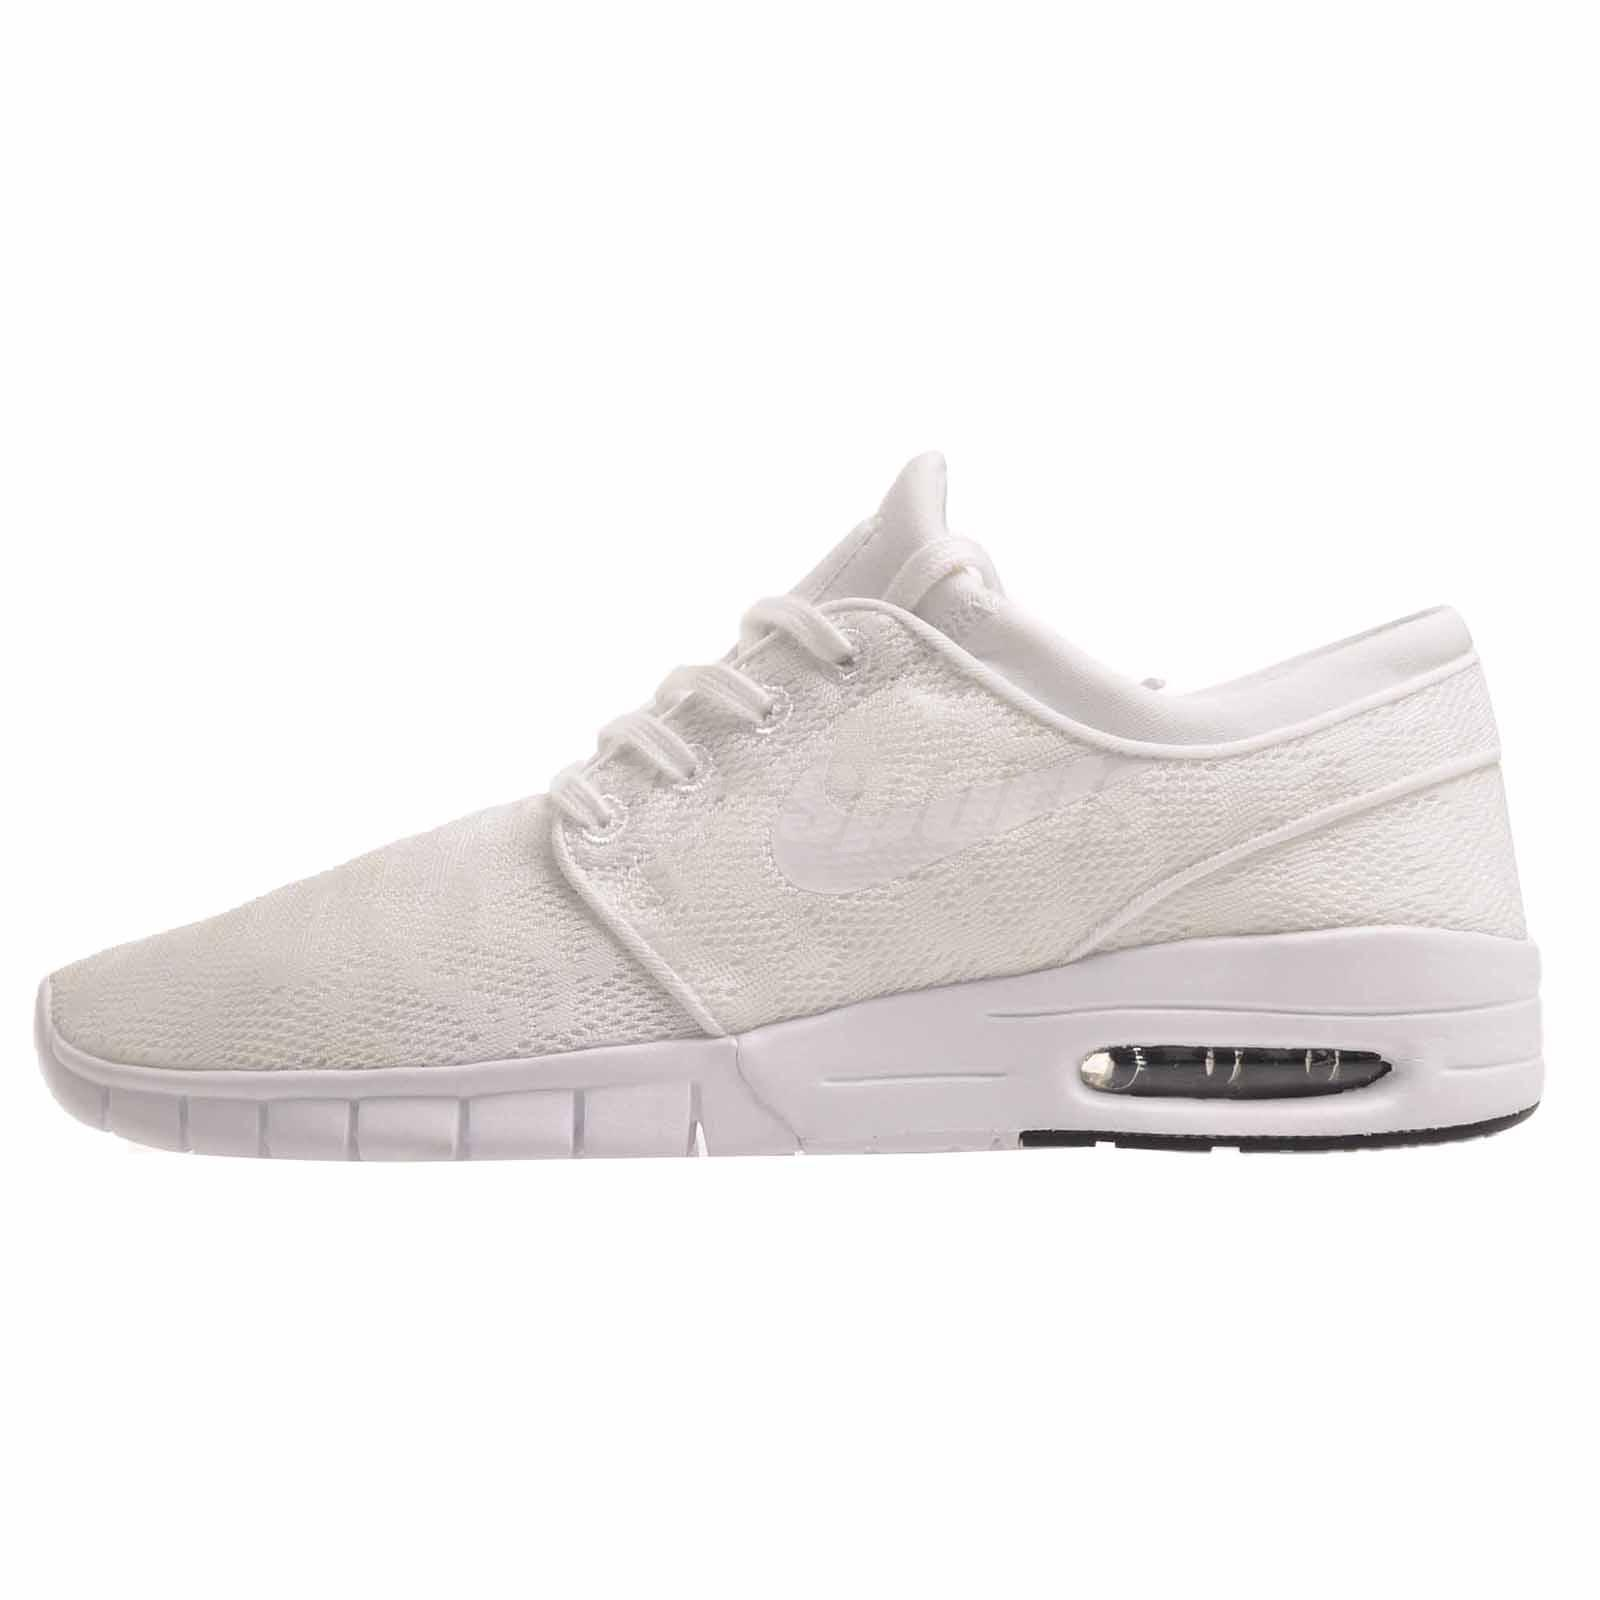 pretty nice 1d21e f65ee Details about Nike Stefan Janoski Max Skate Boarding Mens SB Shoes  White White 631303-114